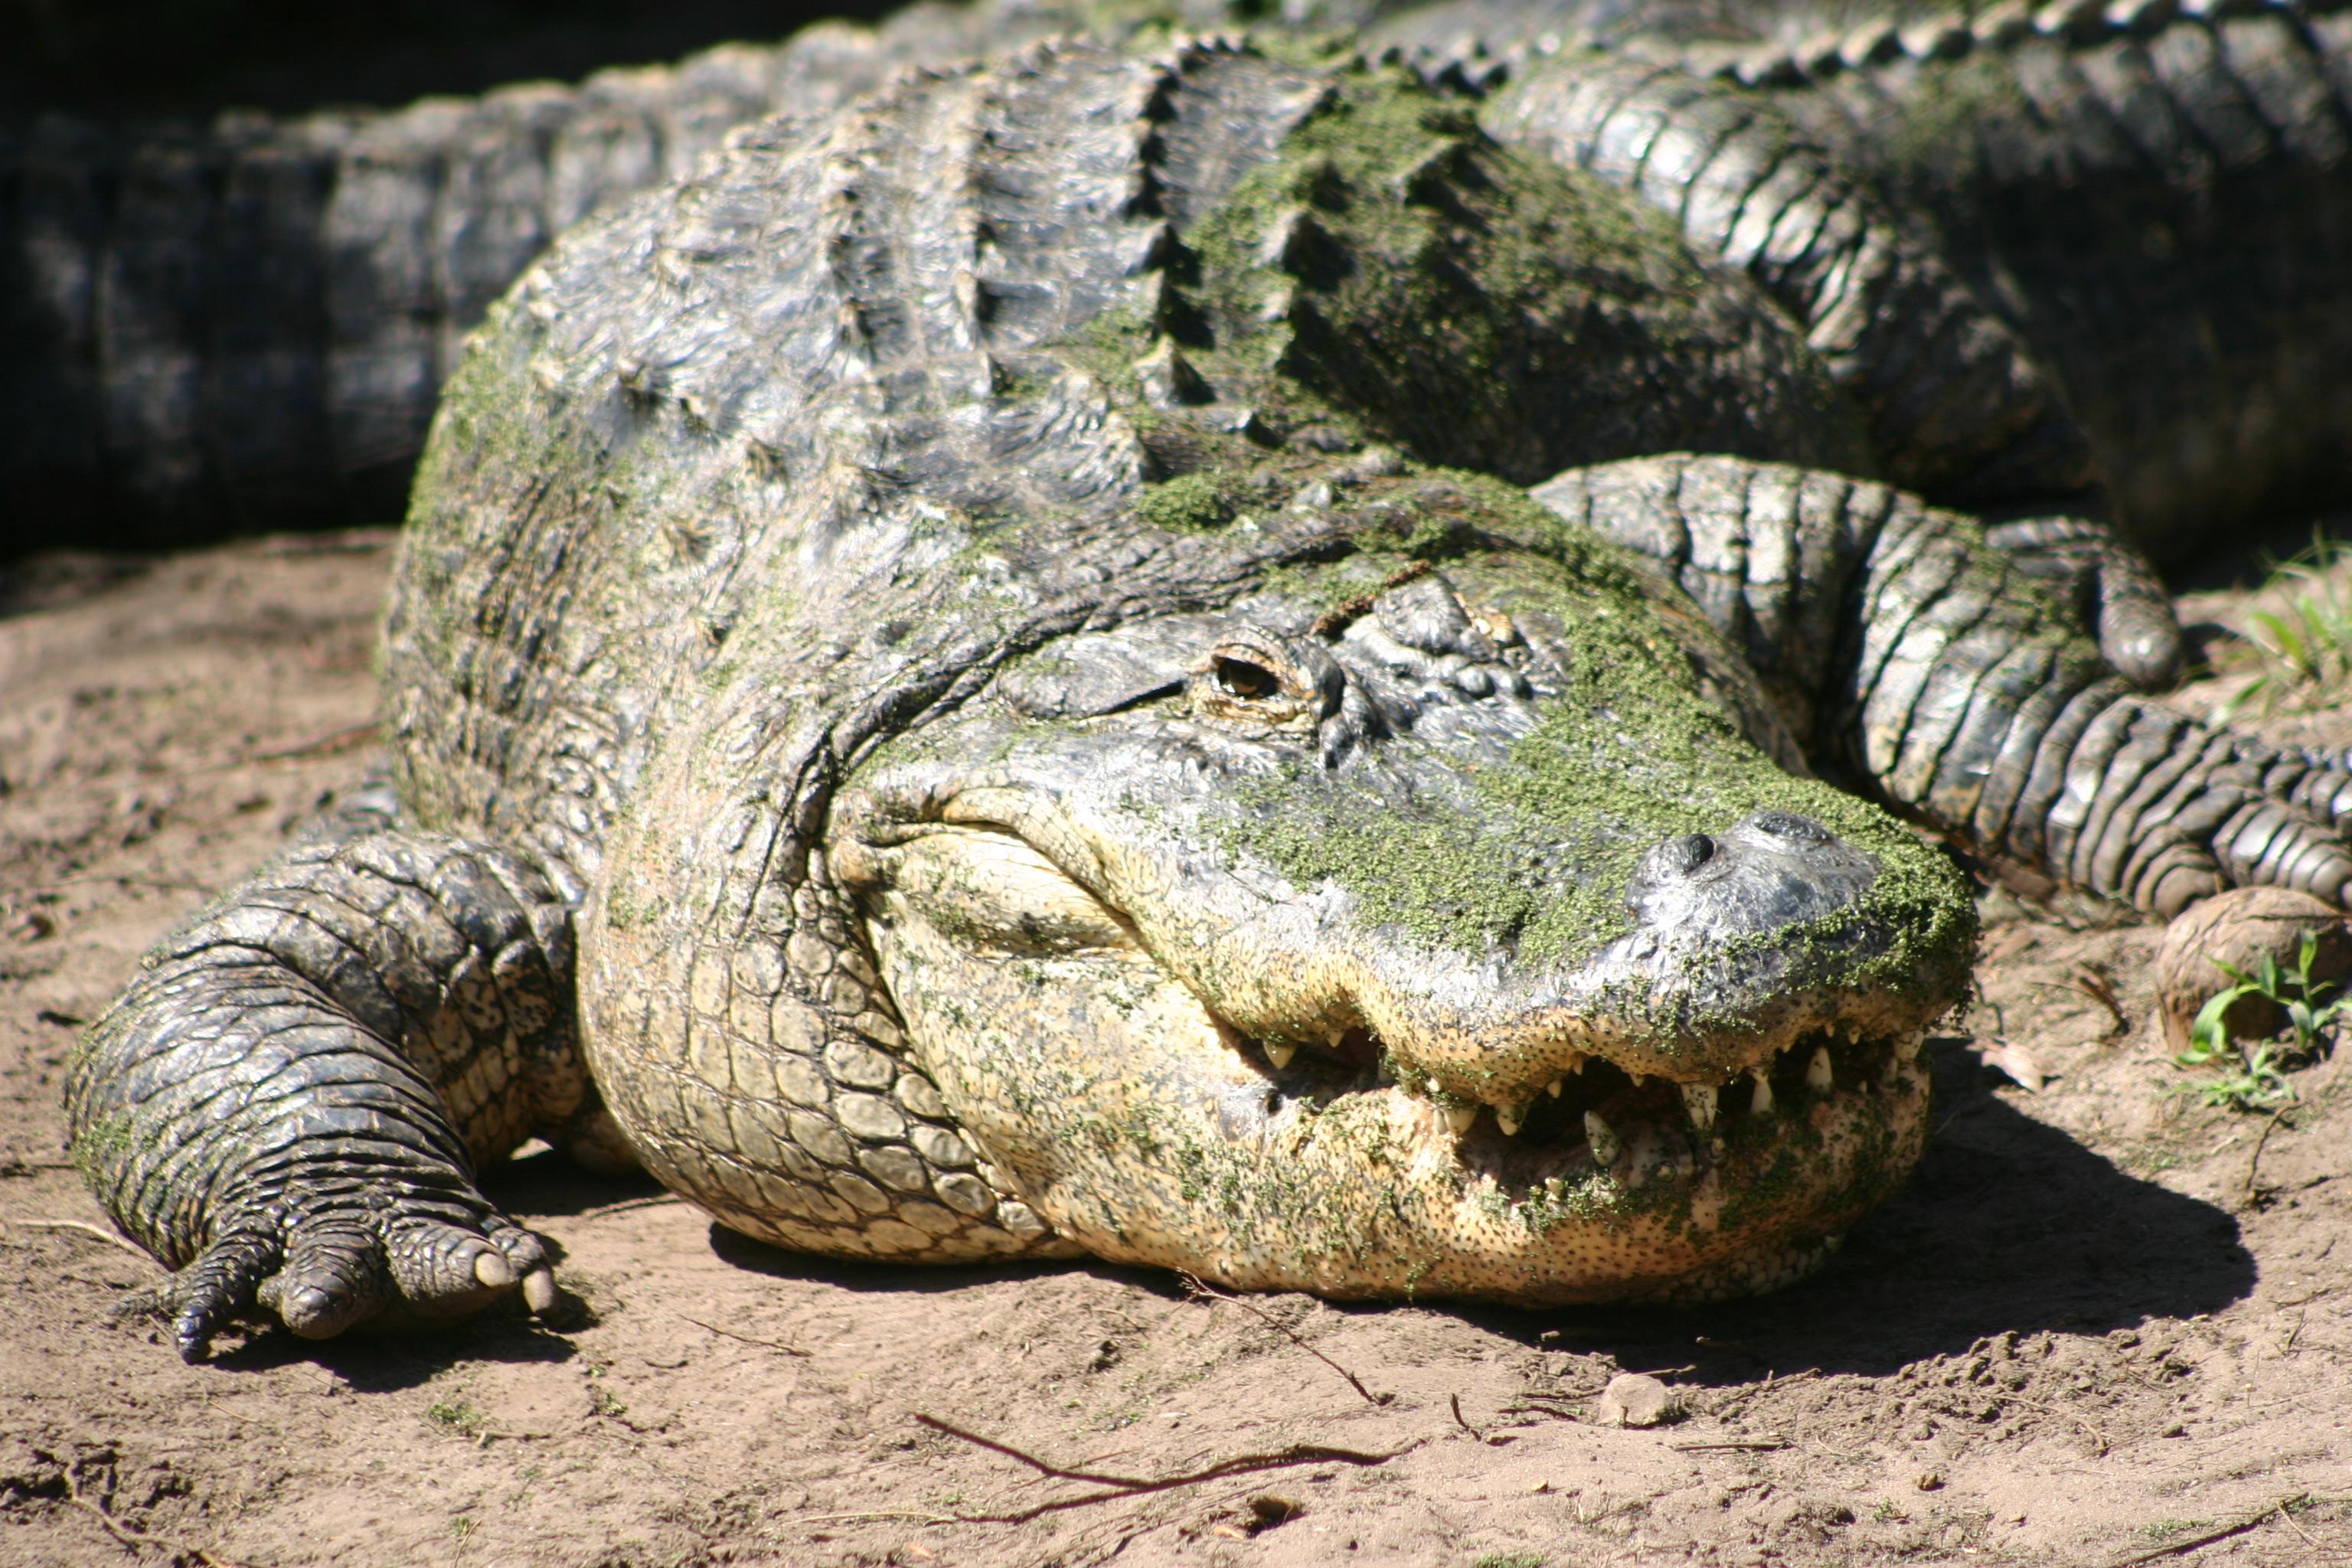 Crocodile Reptile Wildlife 3072x2048